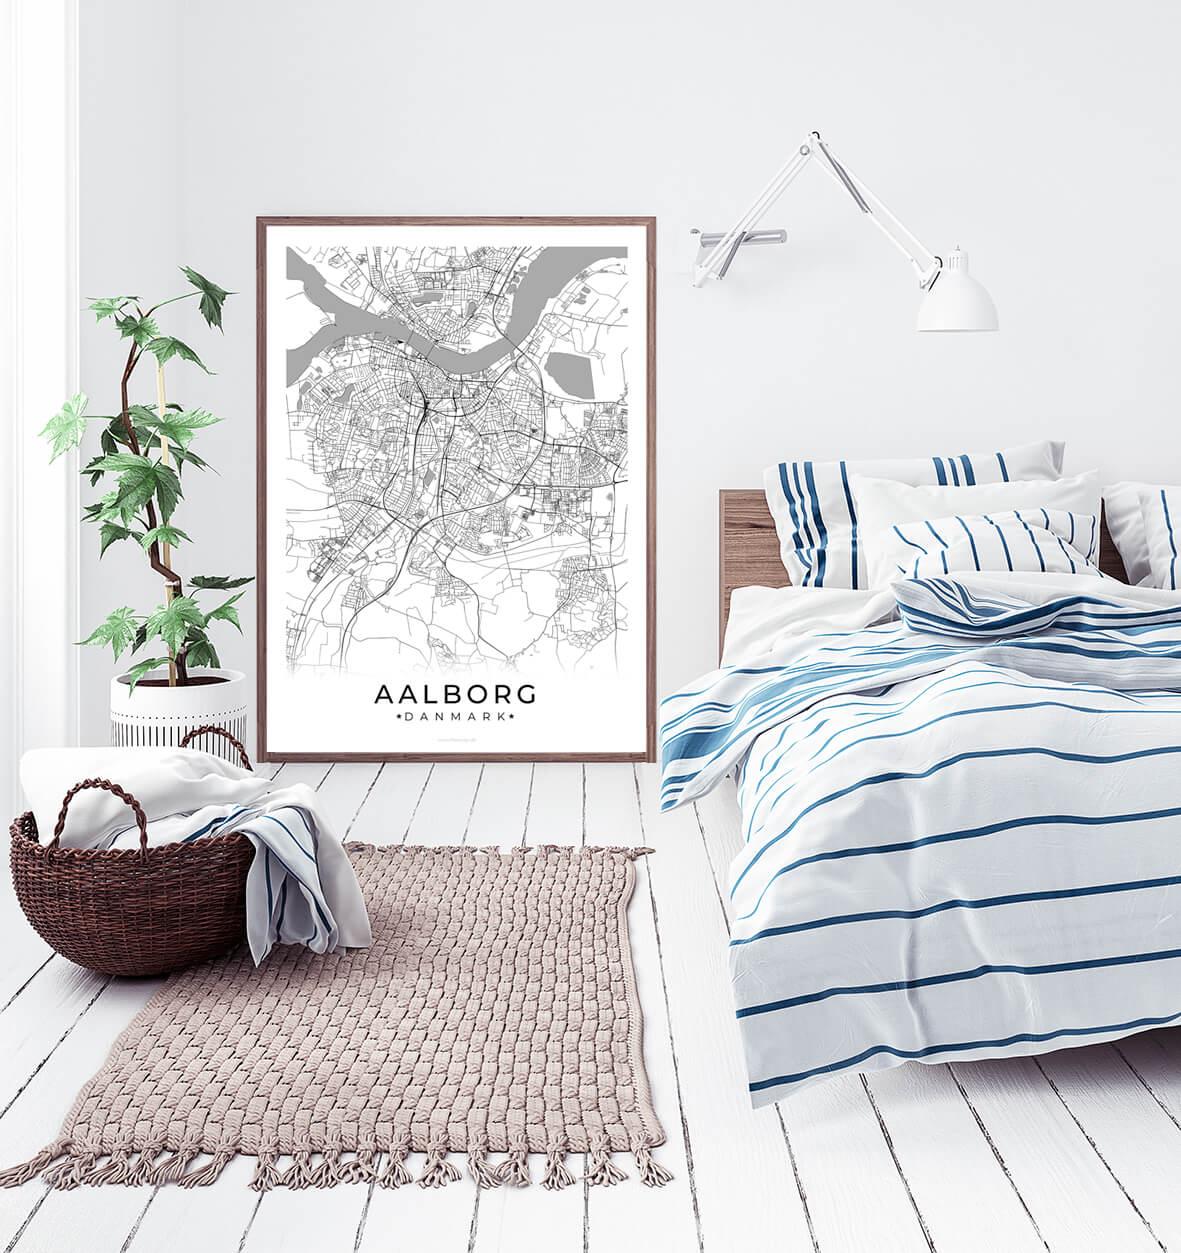 Aalborg-hvid-byplakat-2